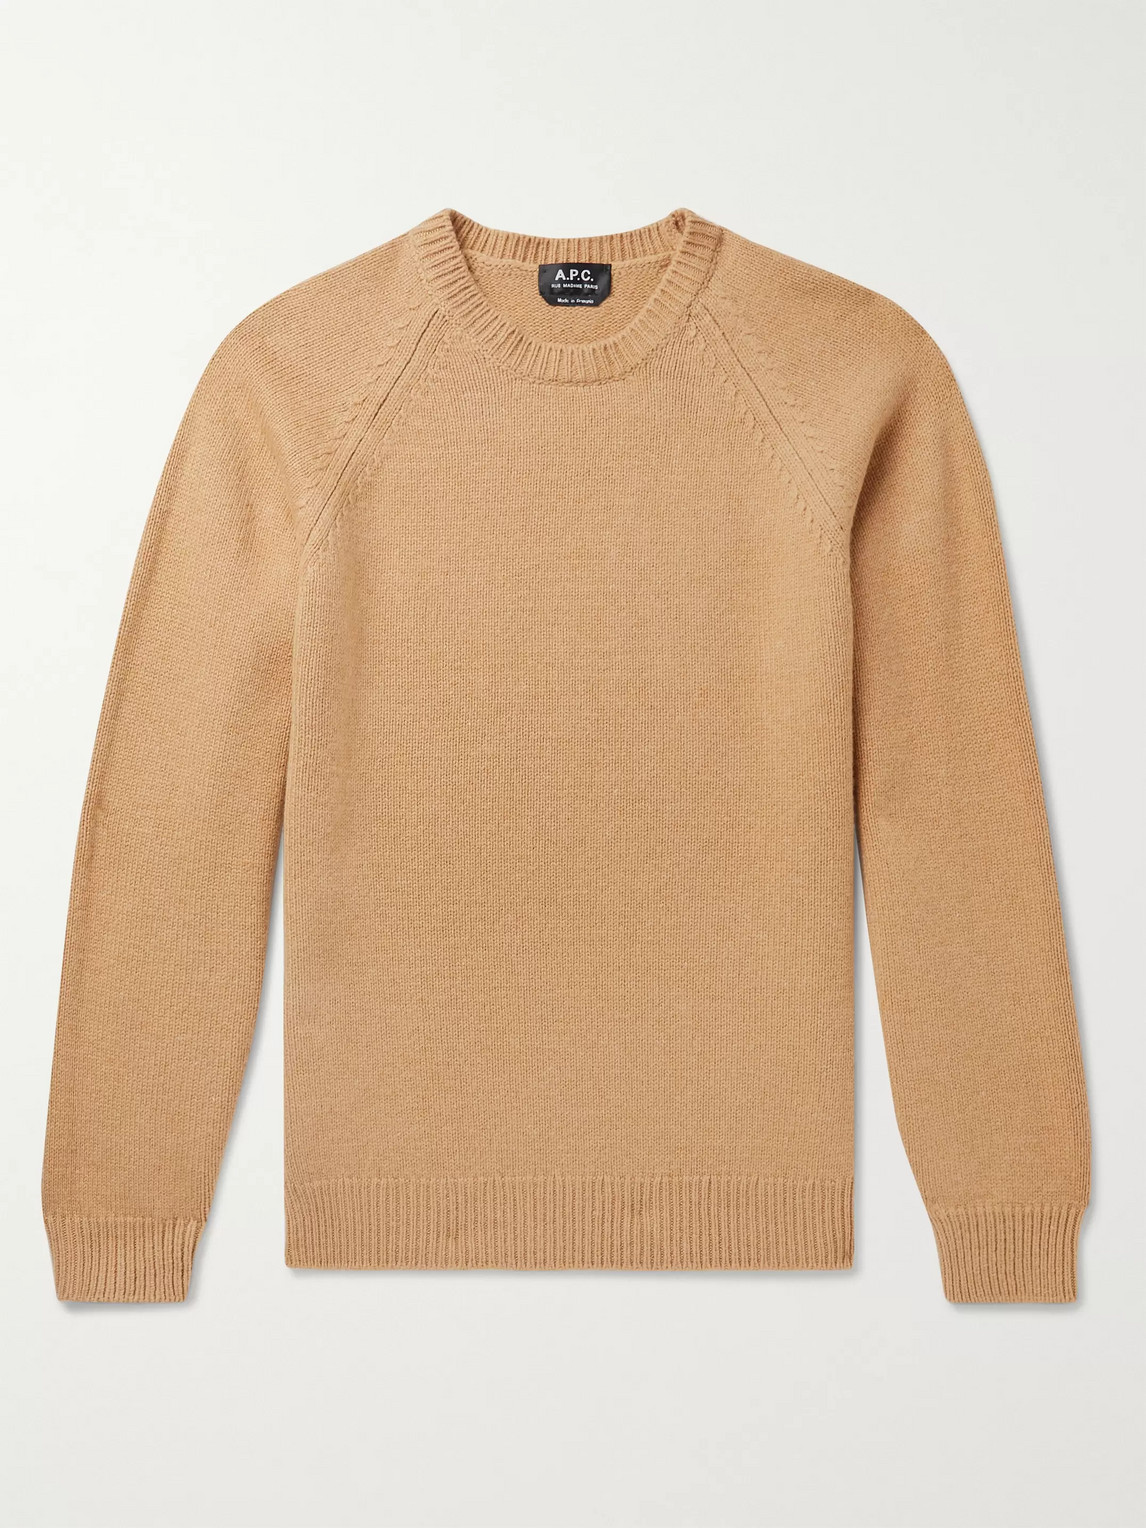 A.p.c. Sweaters PABLO WOOL SWEATER